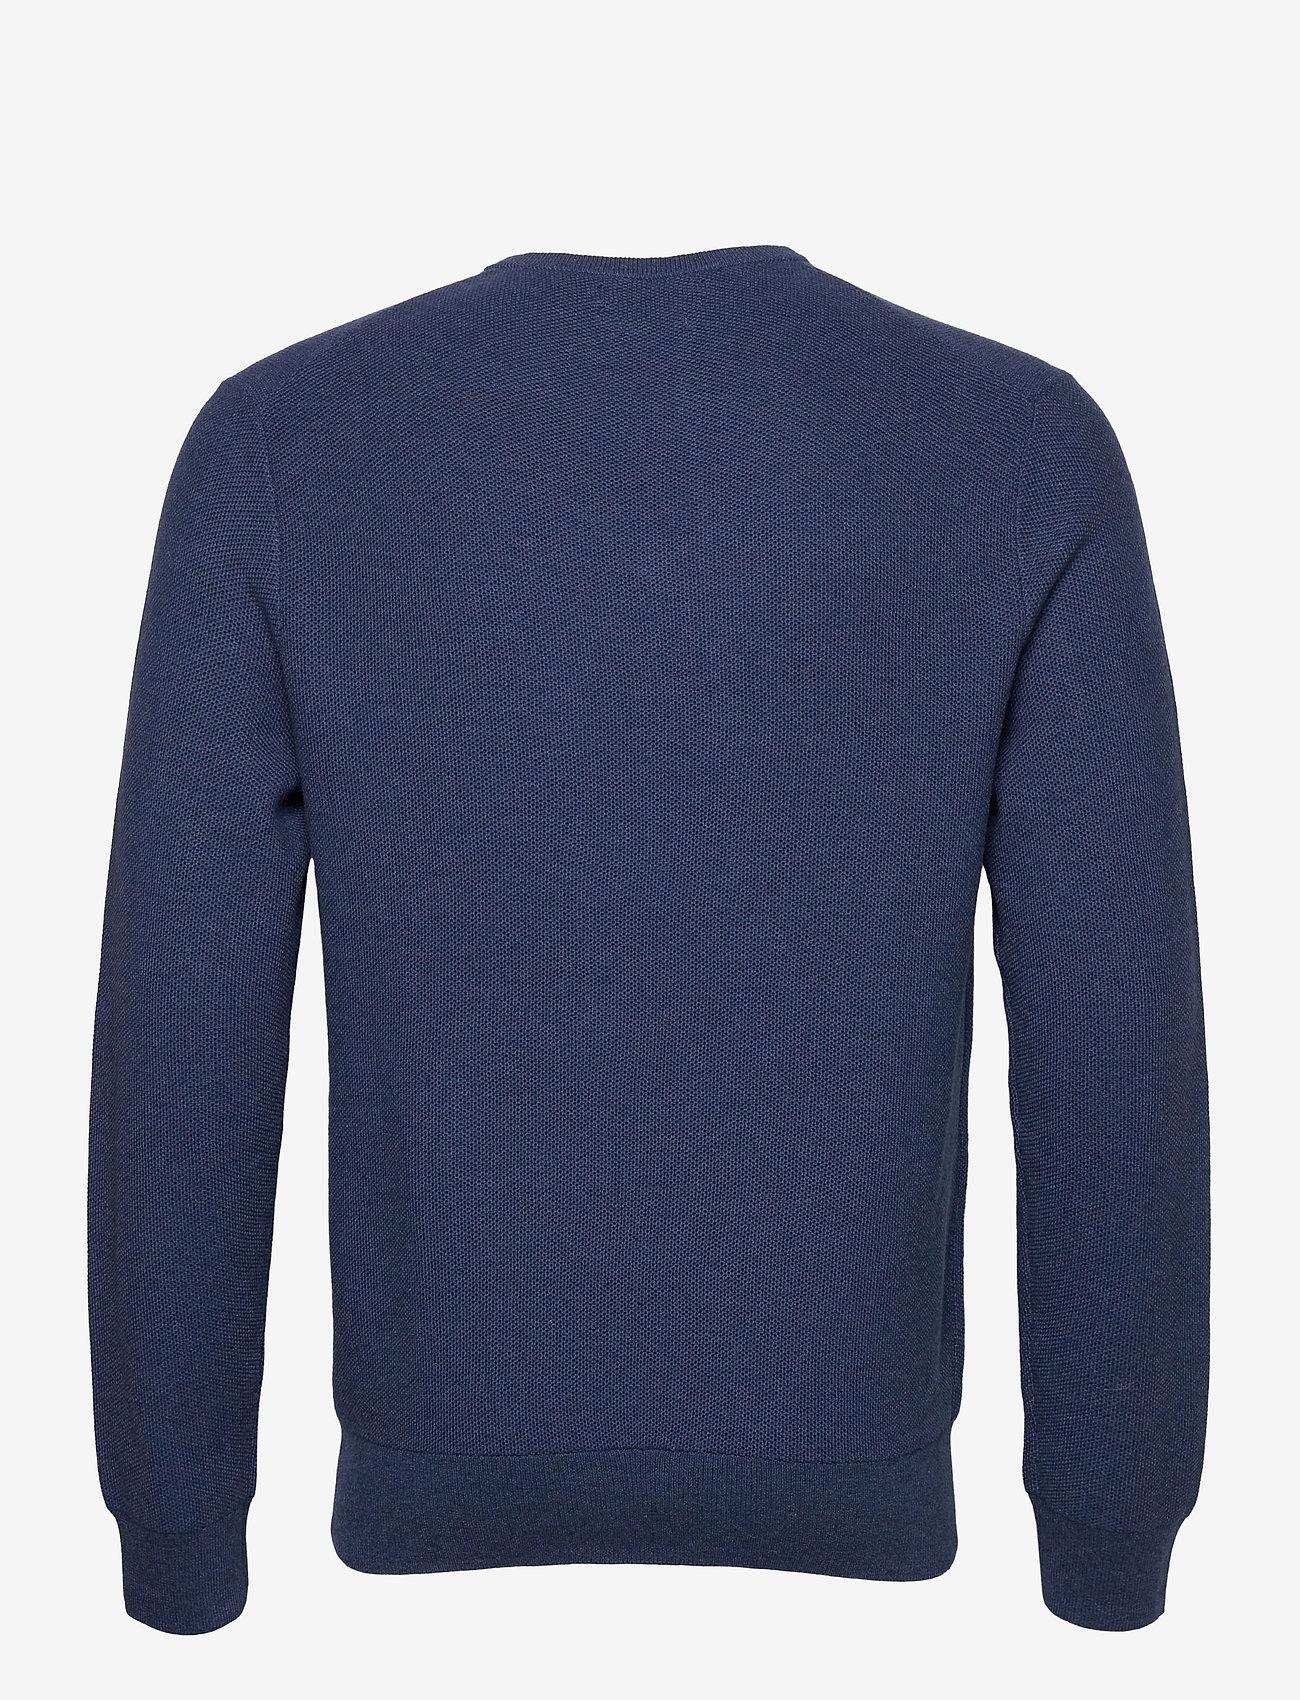 Polo Ralph Lauren - PIMA COTTON-LS TEXTURE VN - tops - rustic navy heath - 1